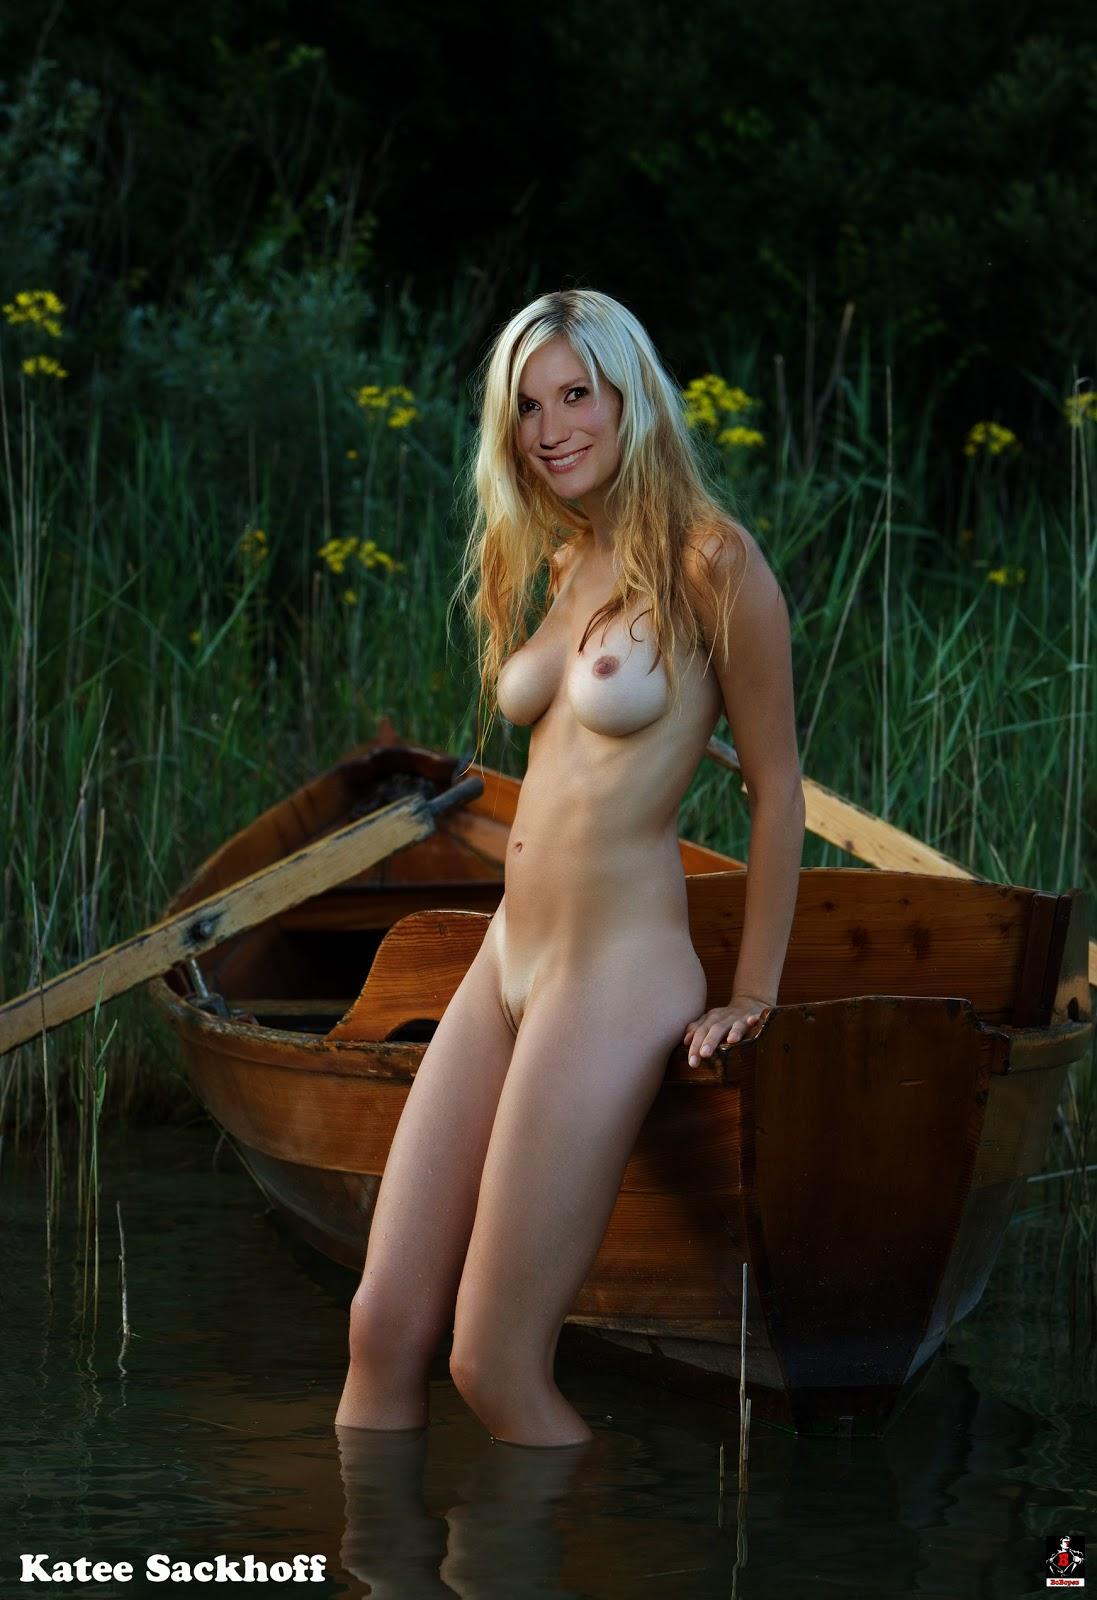 pics Katee sackhoff naked